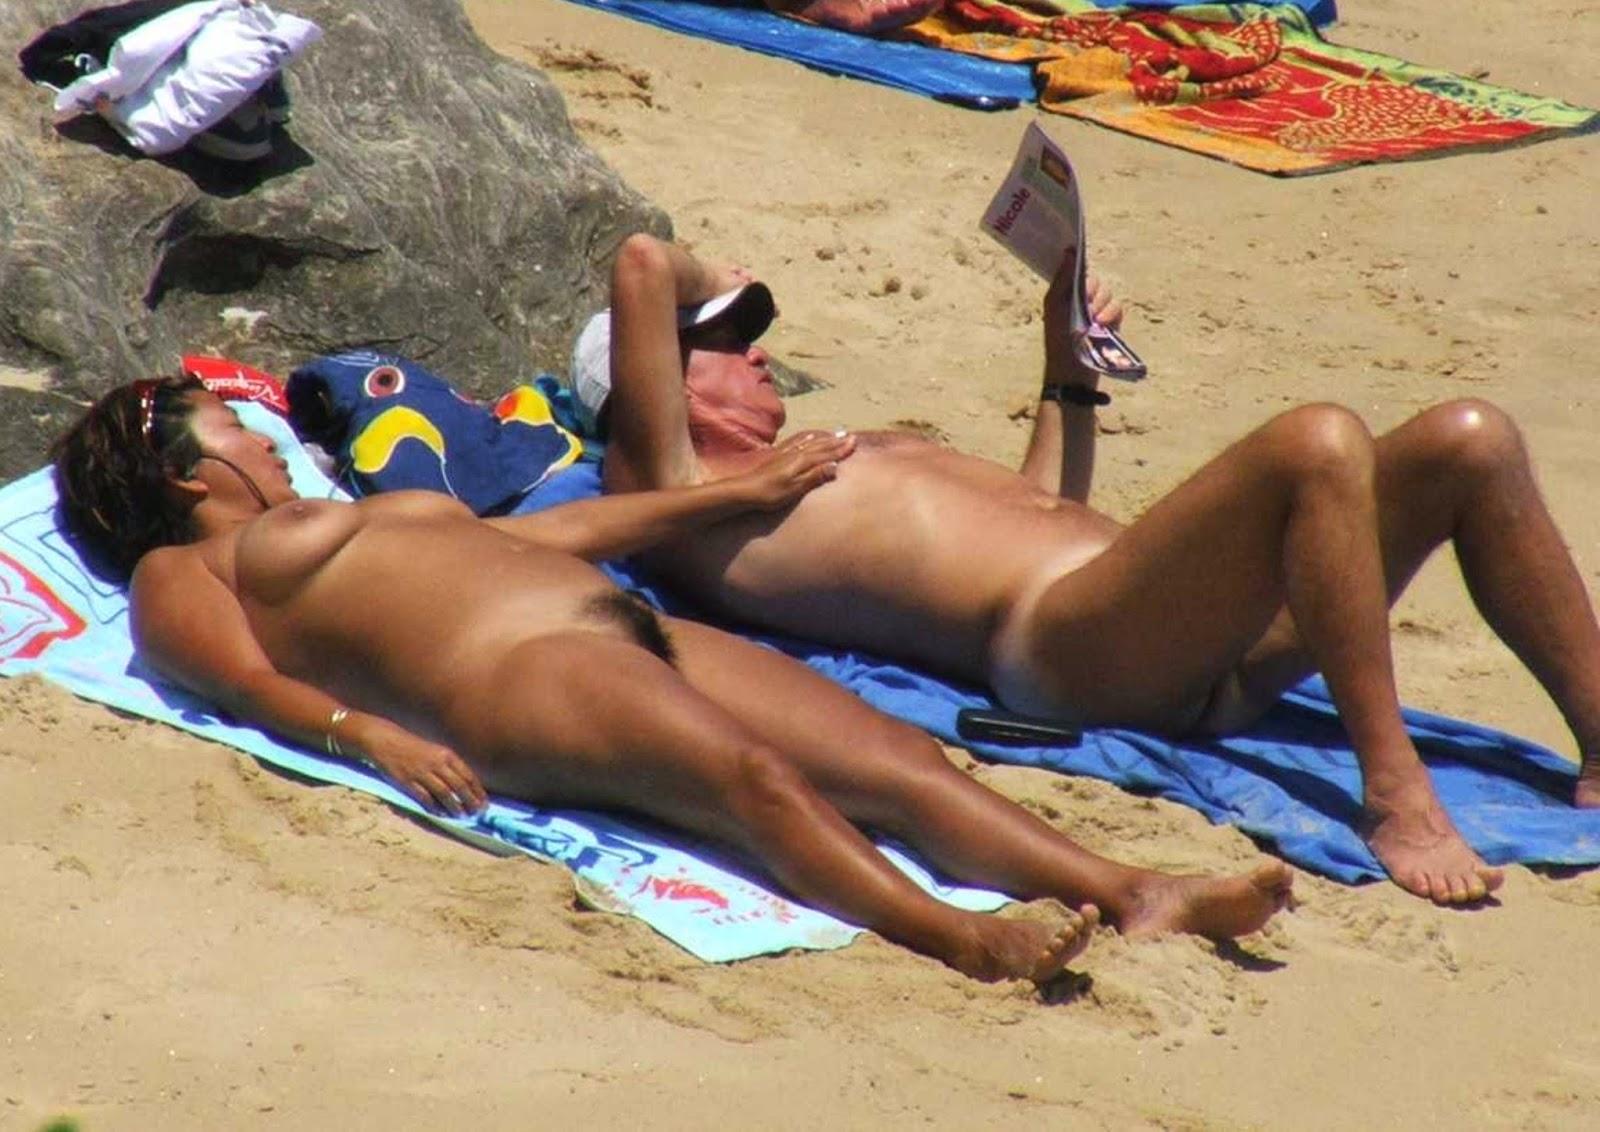 Buxom bikini model